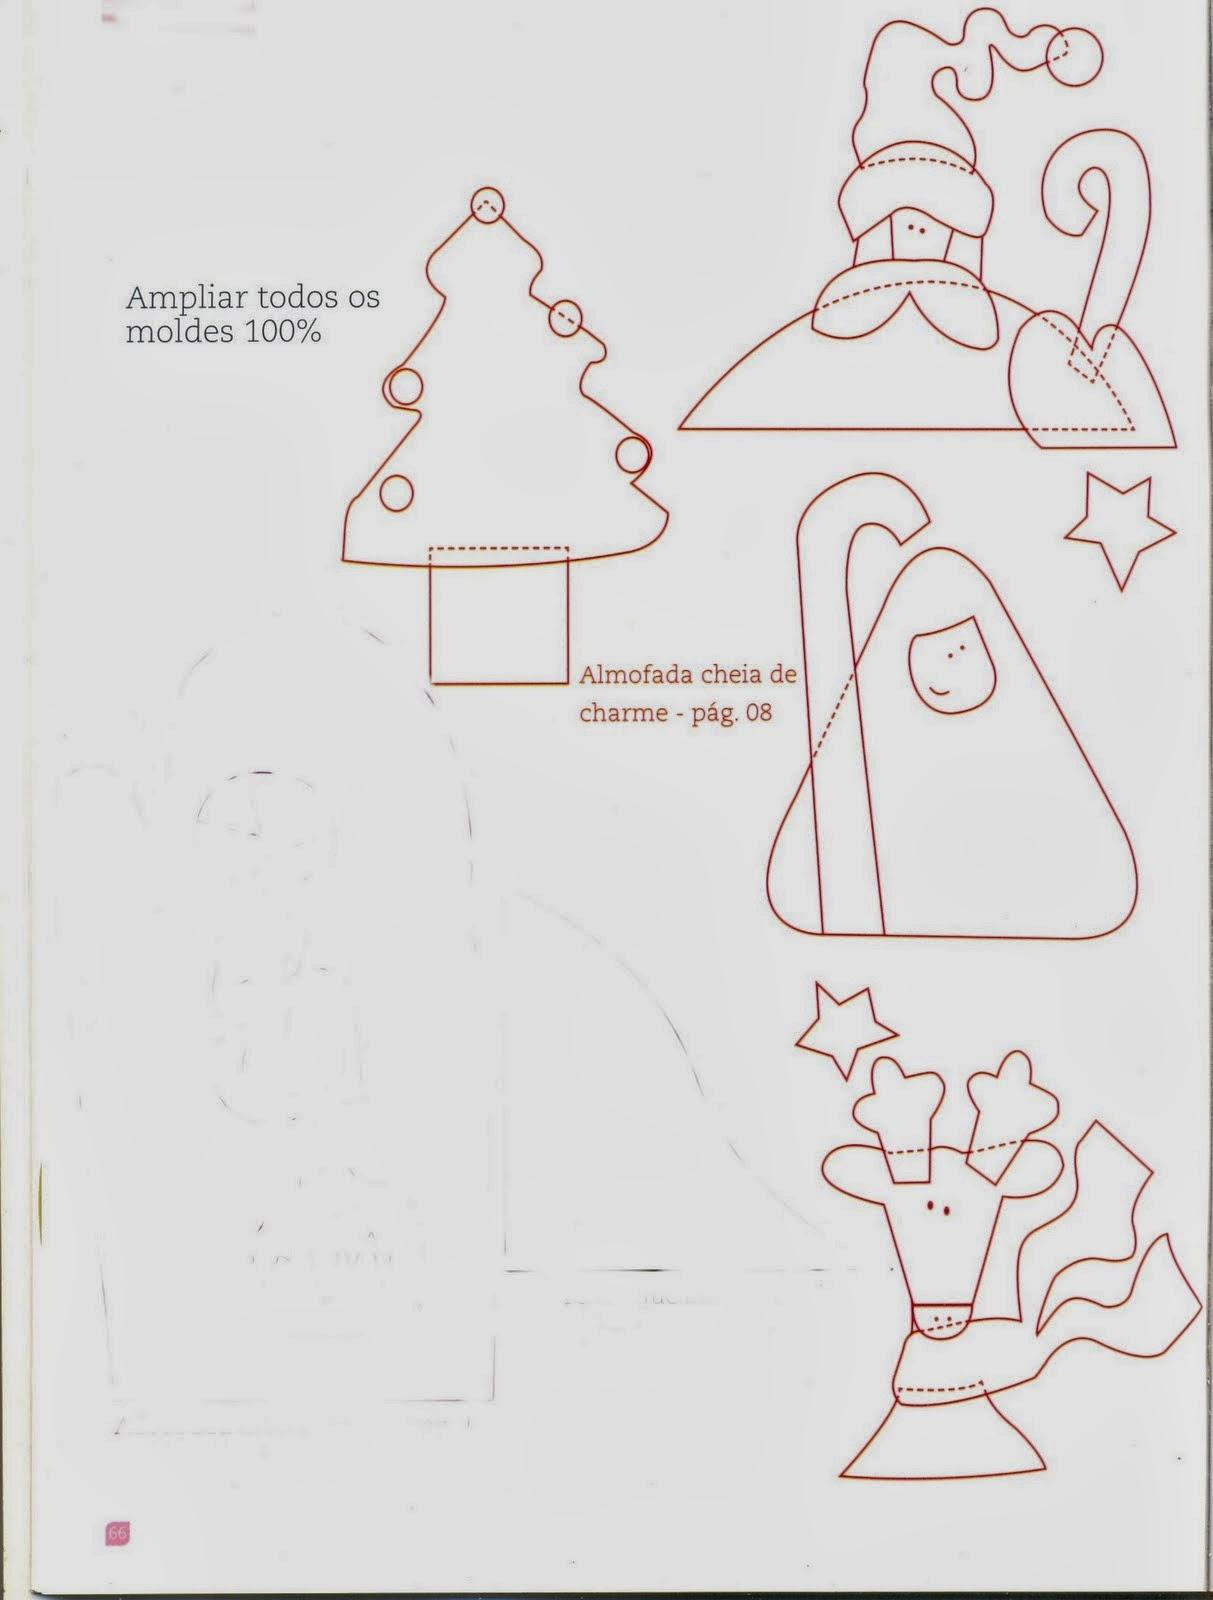 Almofada natalina passo a passo e moldes